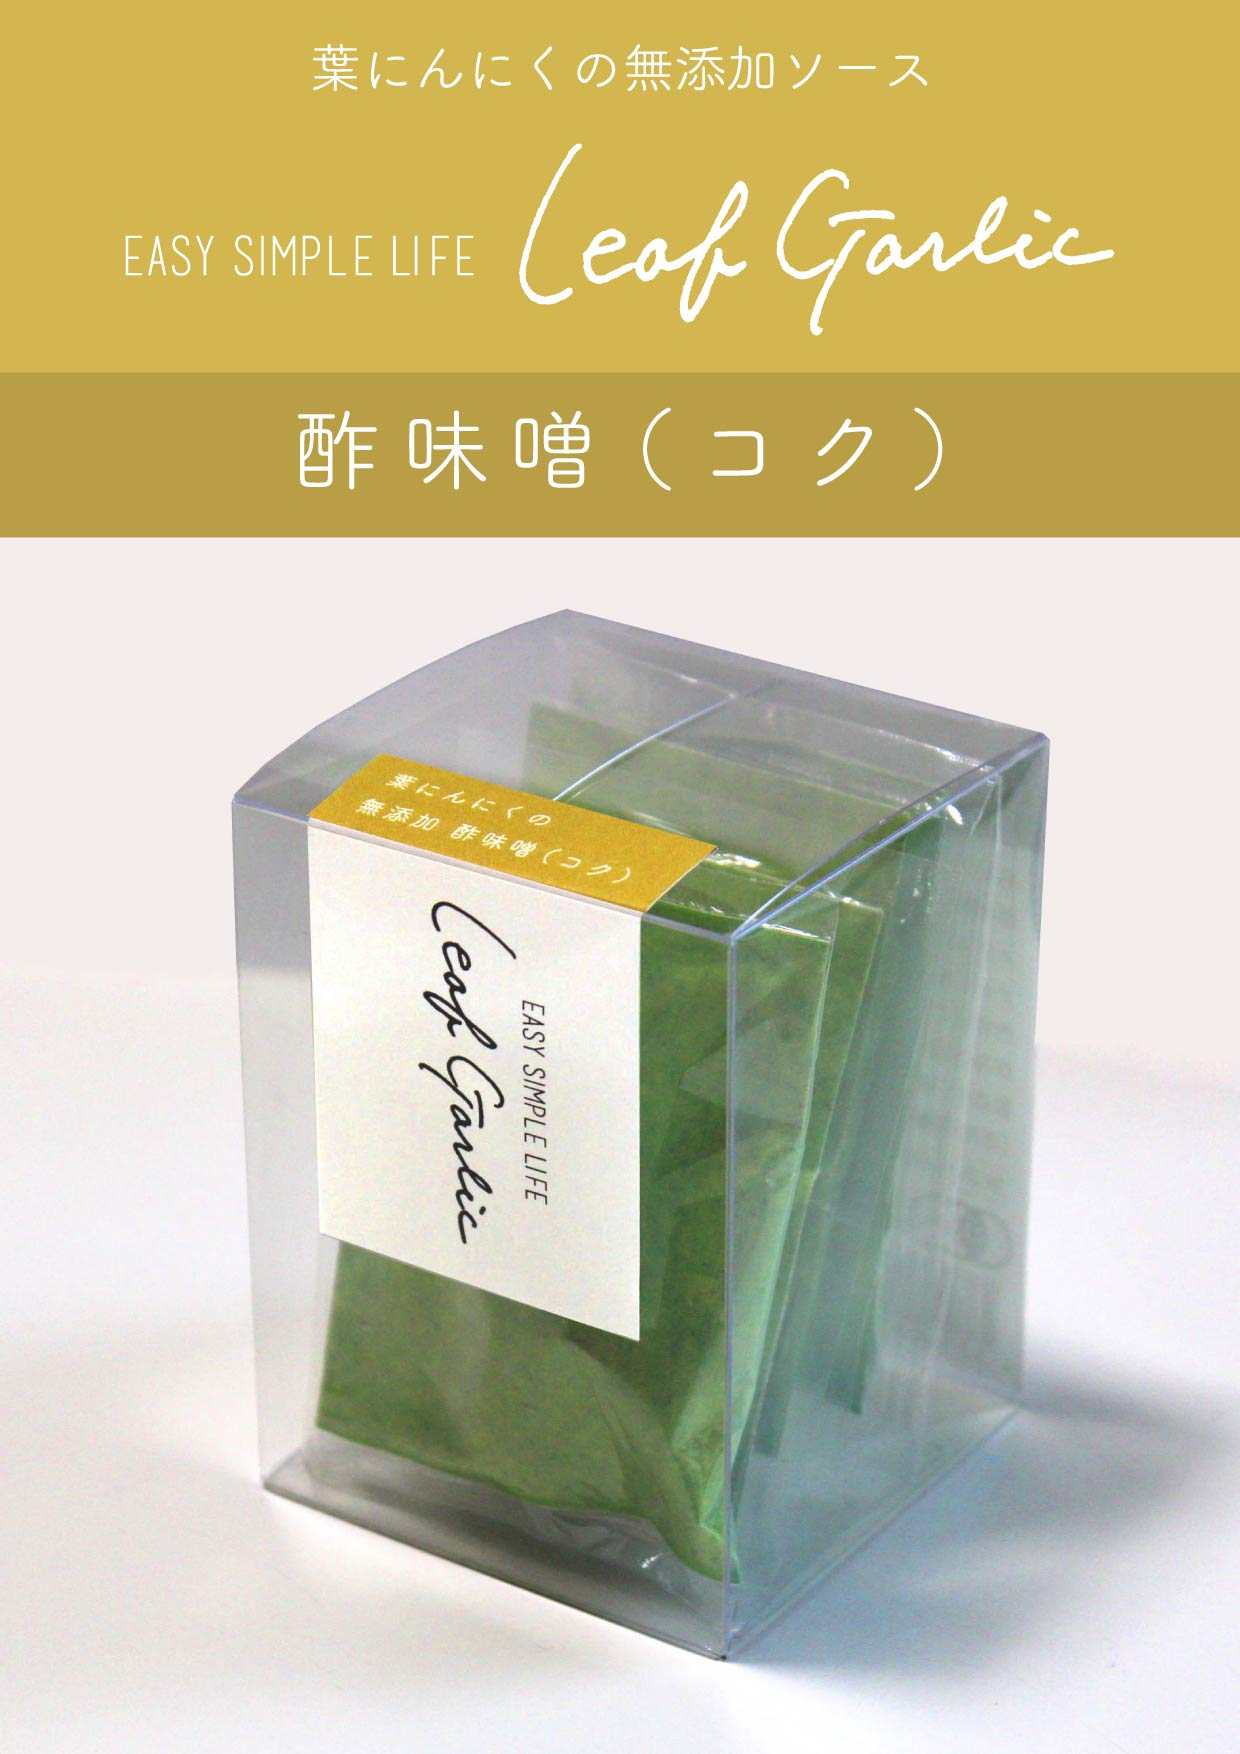 leafgarlic酢味噌(コク)